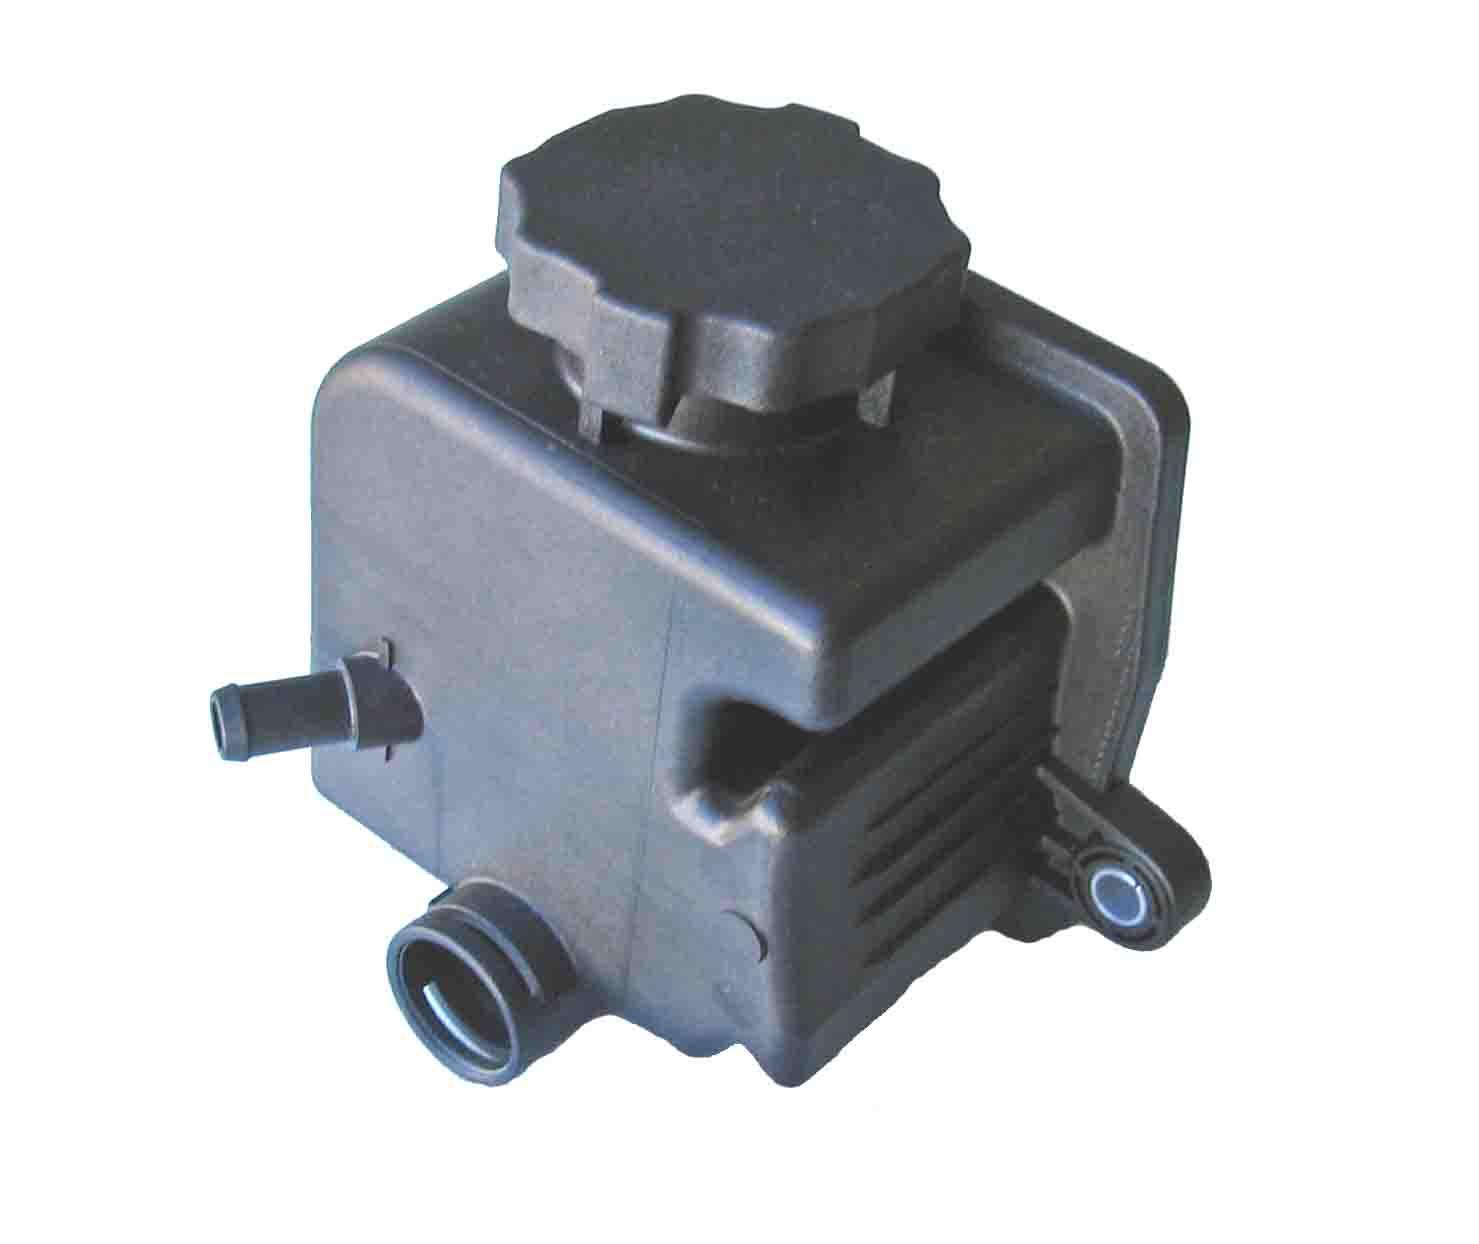 power steering fluid reservoir filter  power  free engine image for user manual download 2000 honda civic manual transmission fluid check 2000 honda civic manual trans fluid